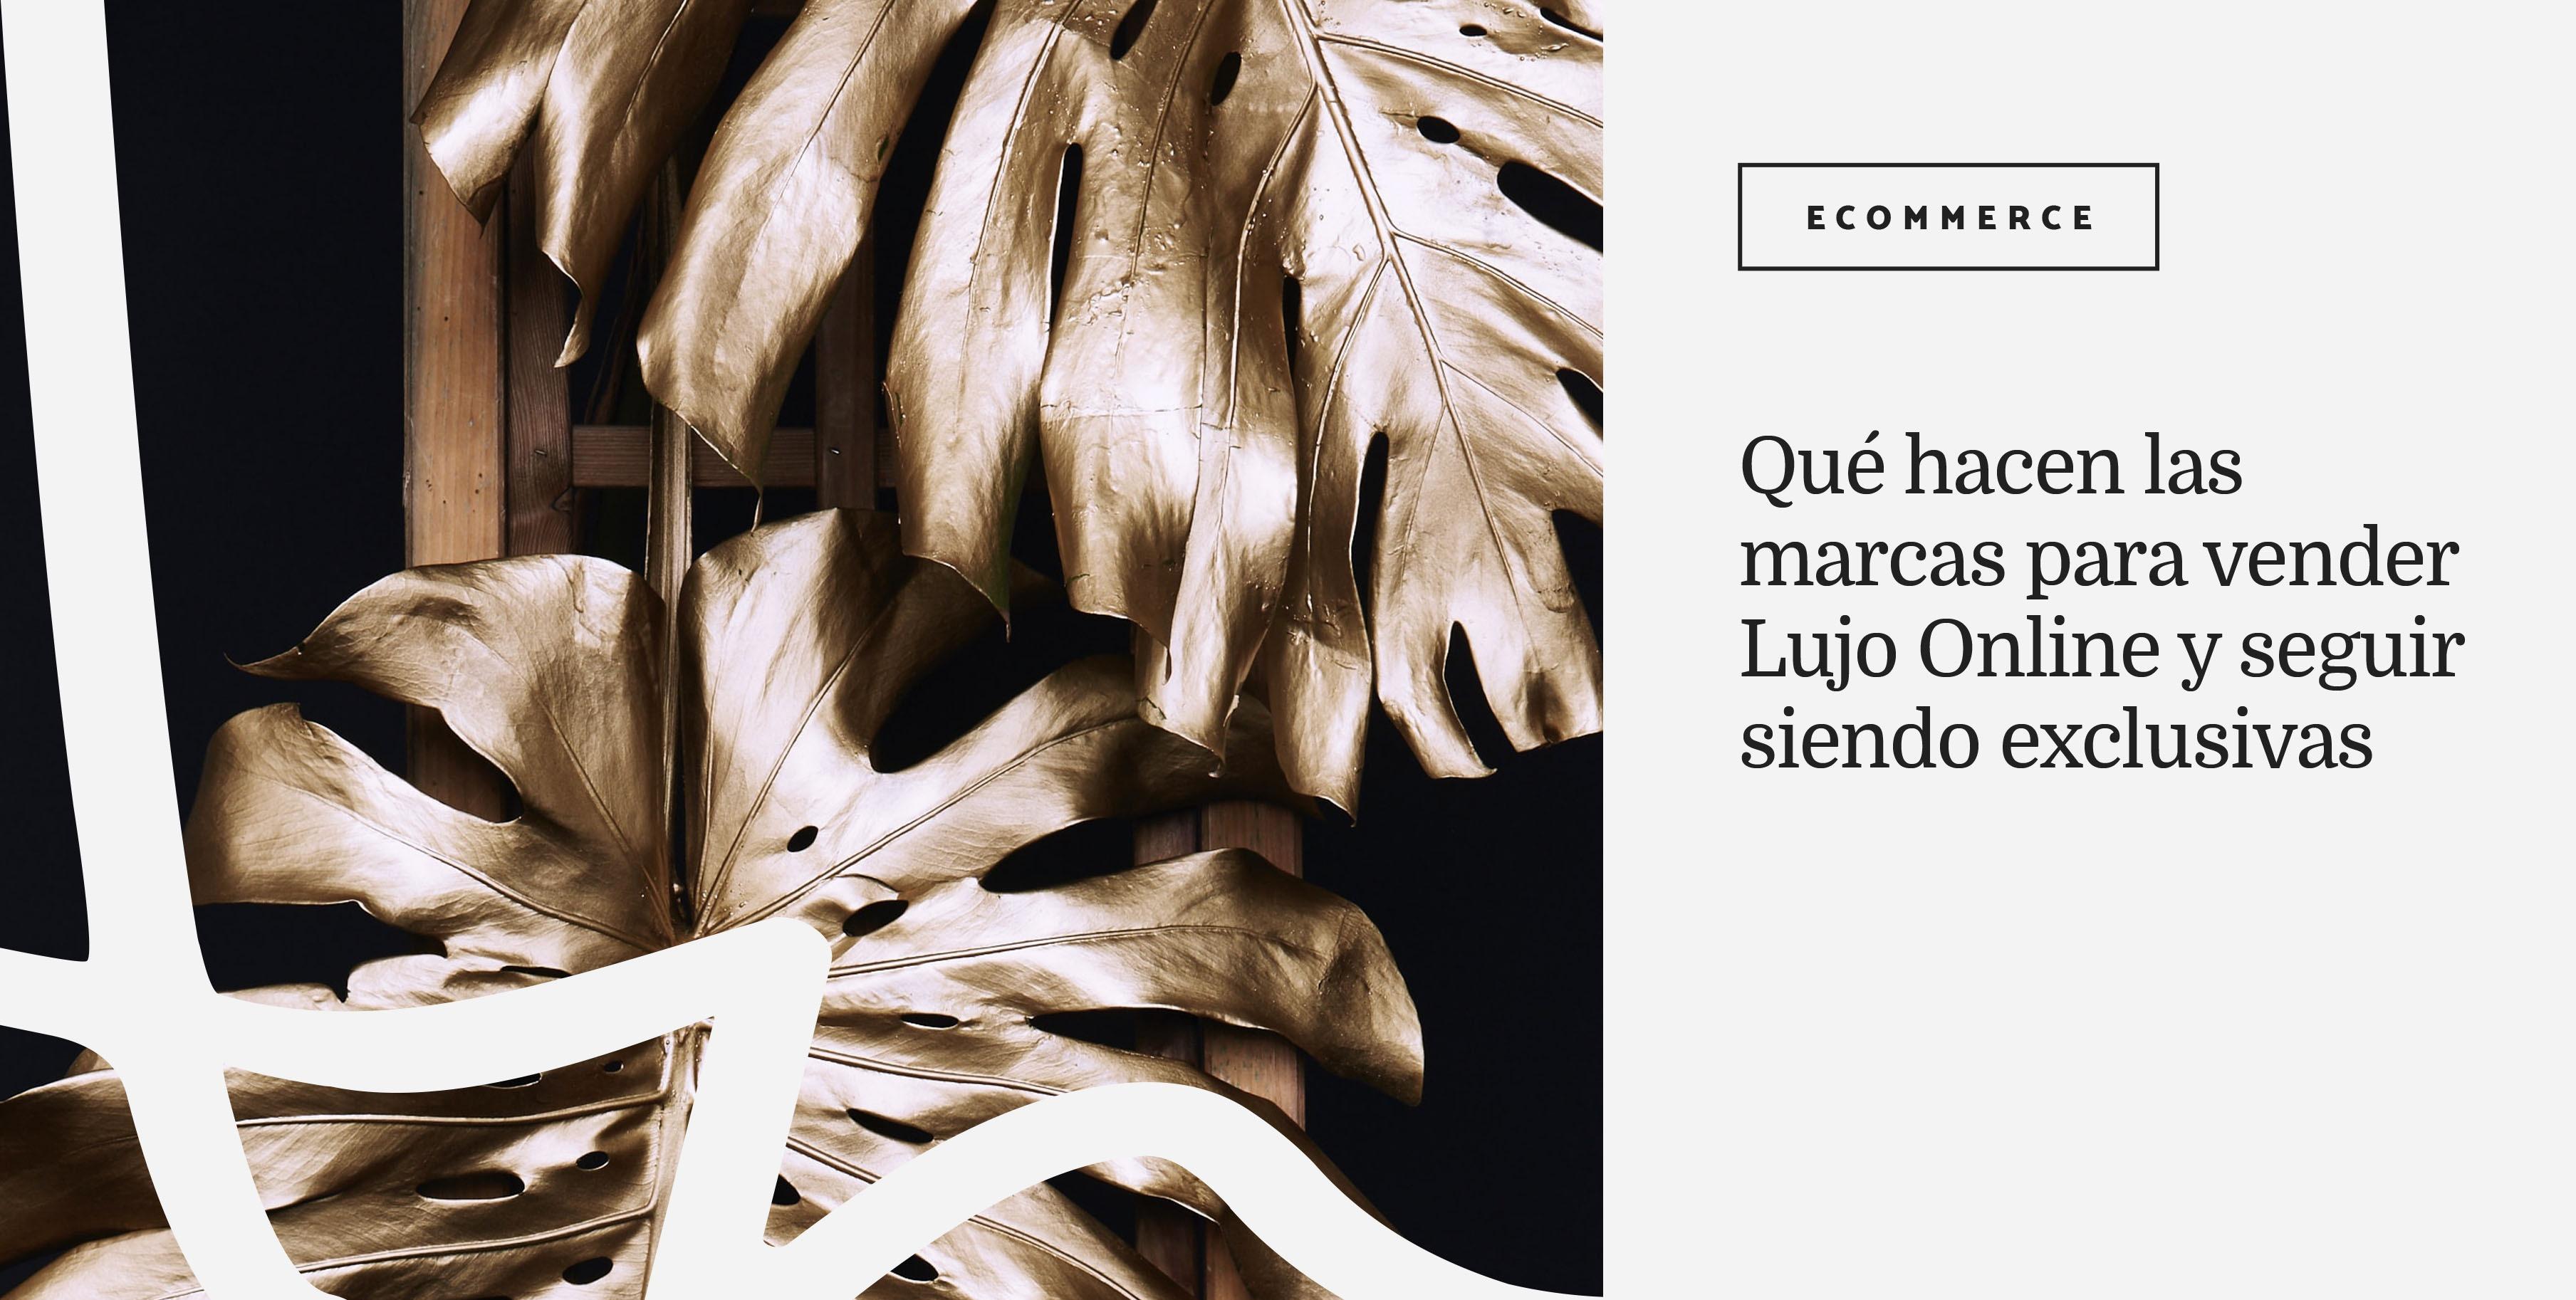 vender-lujo-online-ecommerce-Ana-Diaz-del-Rio-portada.jpg